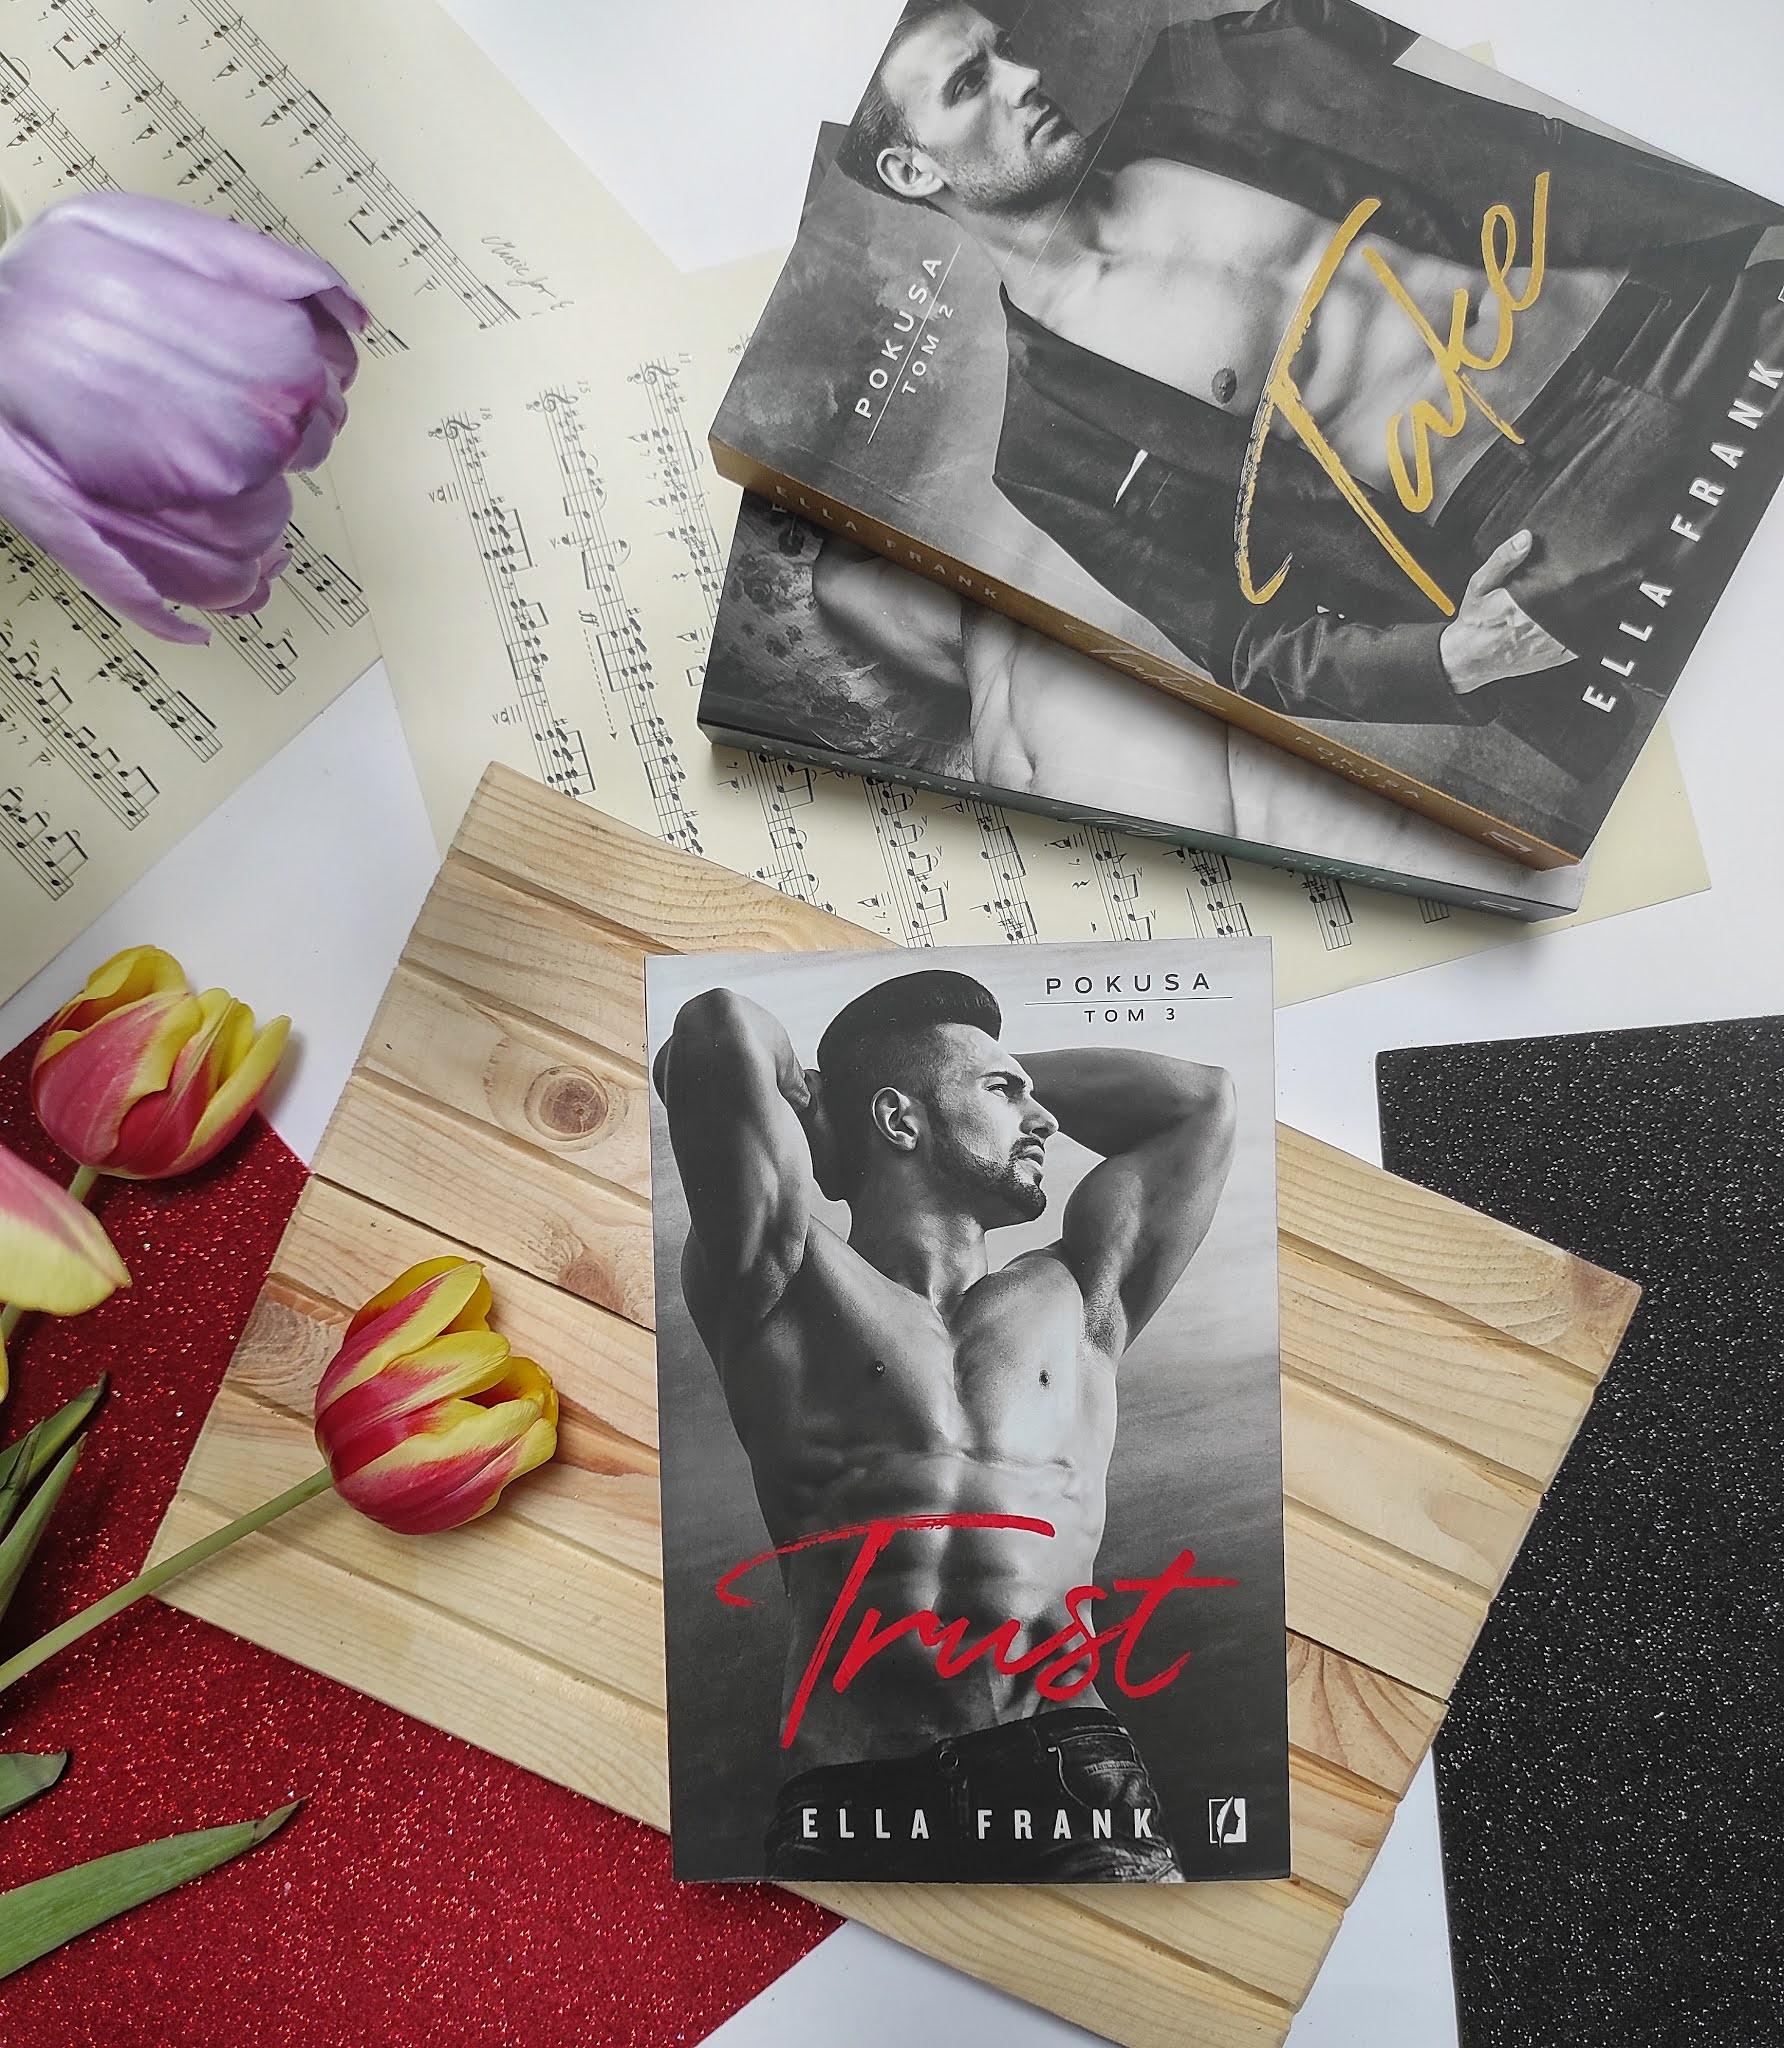 """Trust"" Ella Frank - recenzja"